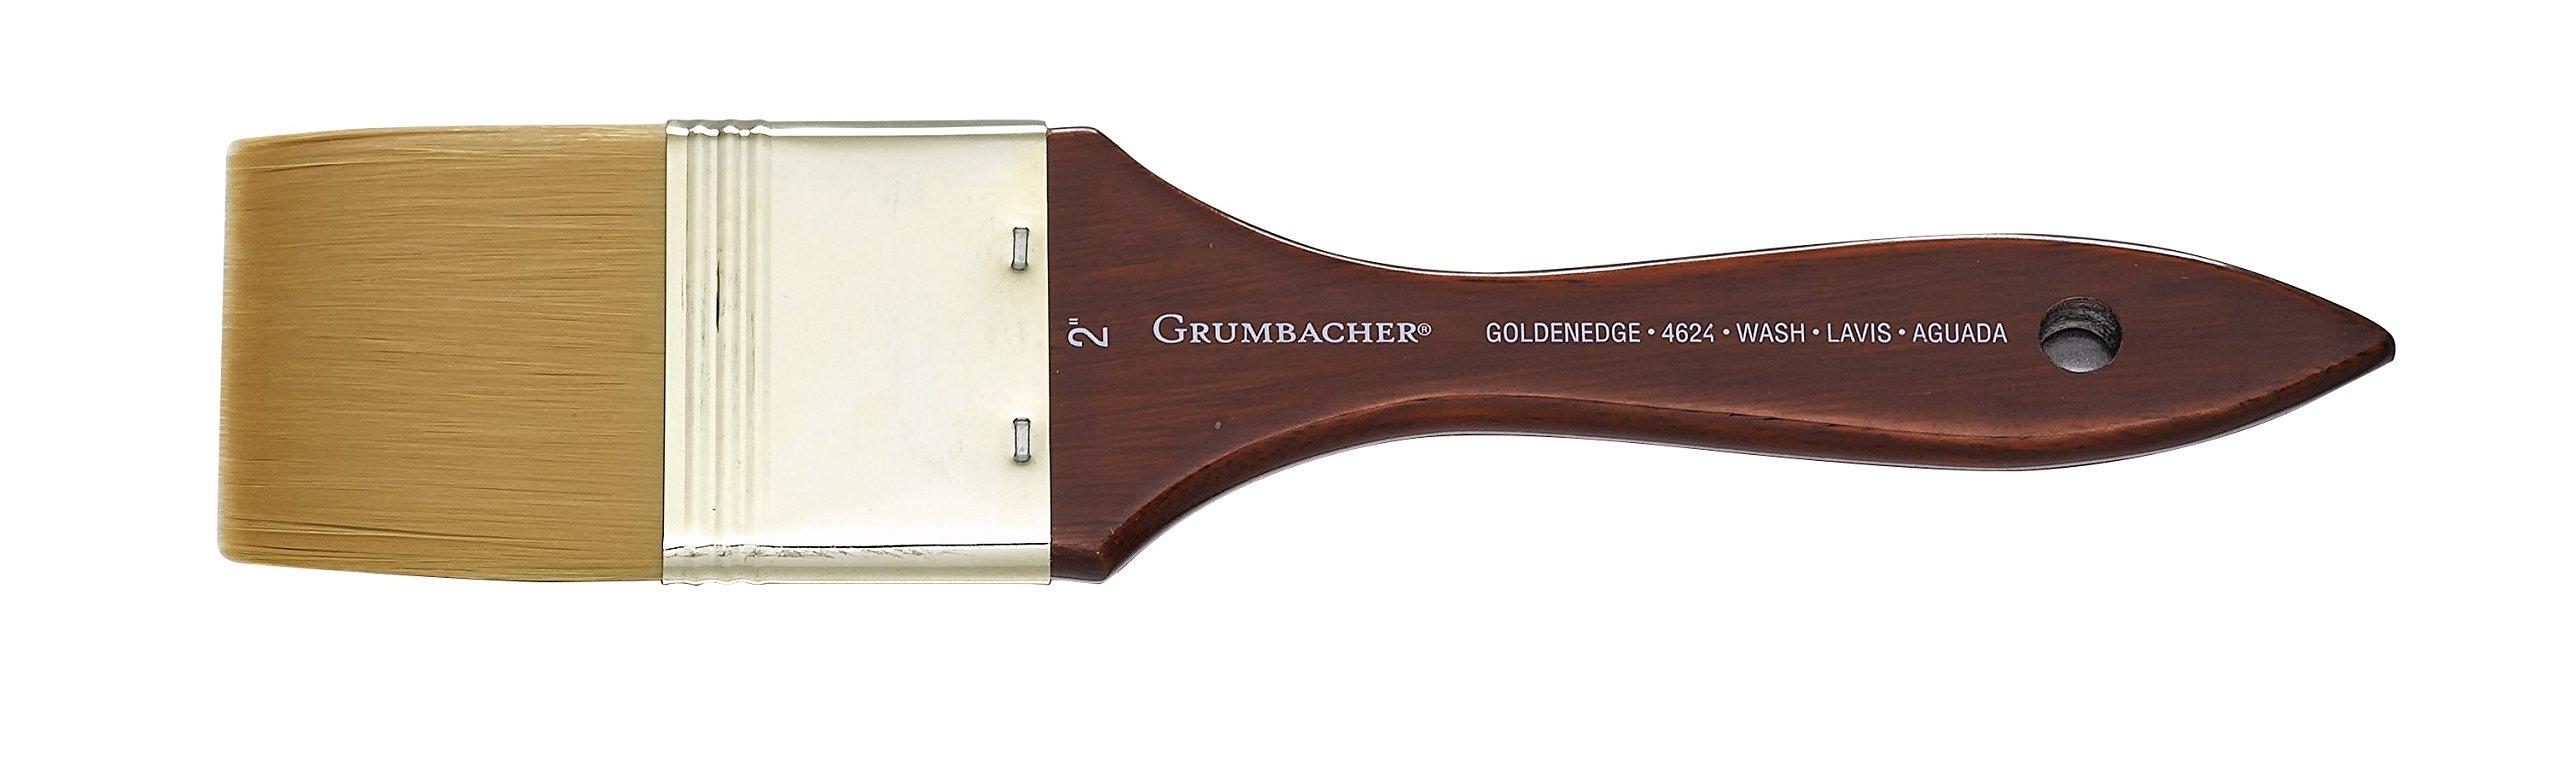 Chartpak Grumbacher Goldenedge Golden Toray Wash Watercolor Brush, Synthetic Bristles, Size 2'' (4624.200) by Chartpak